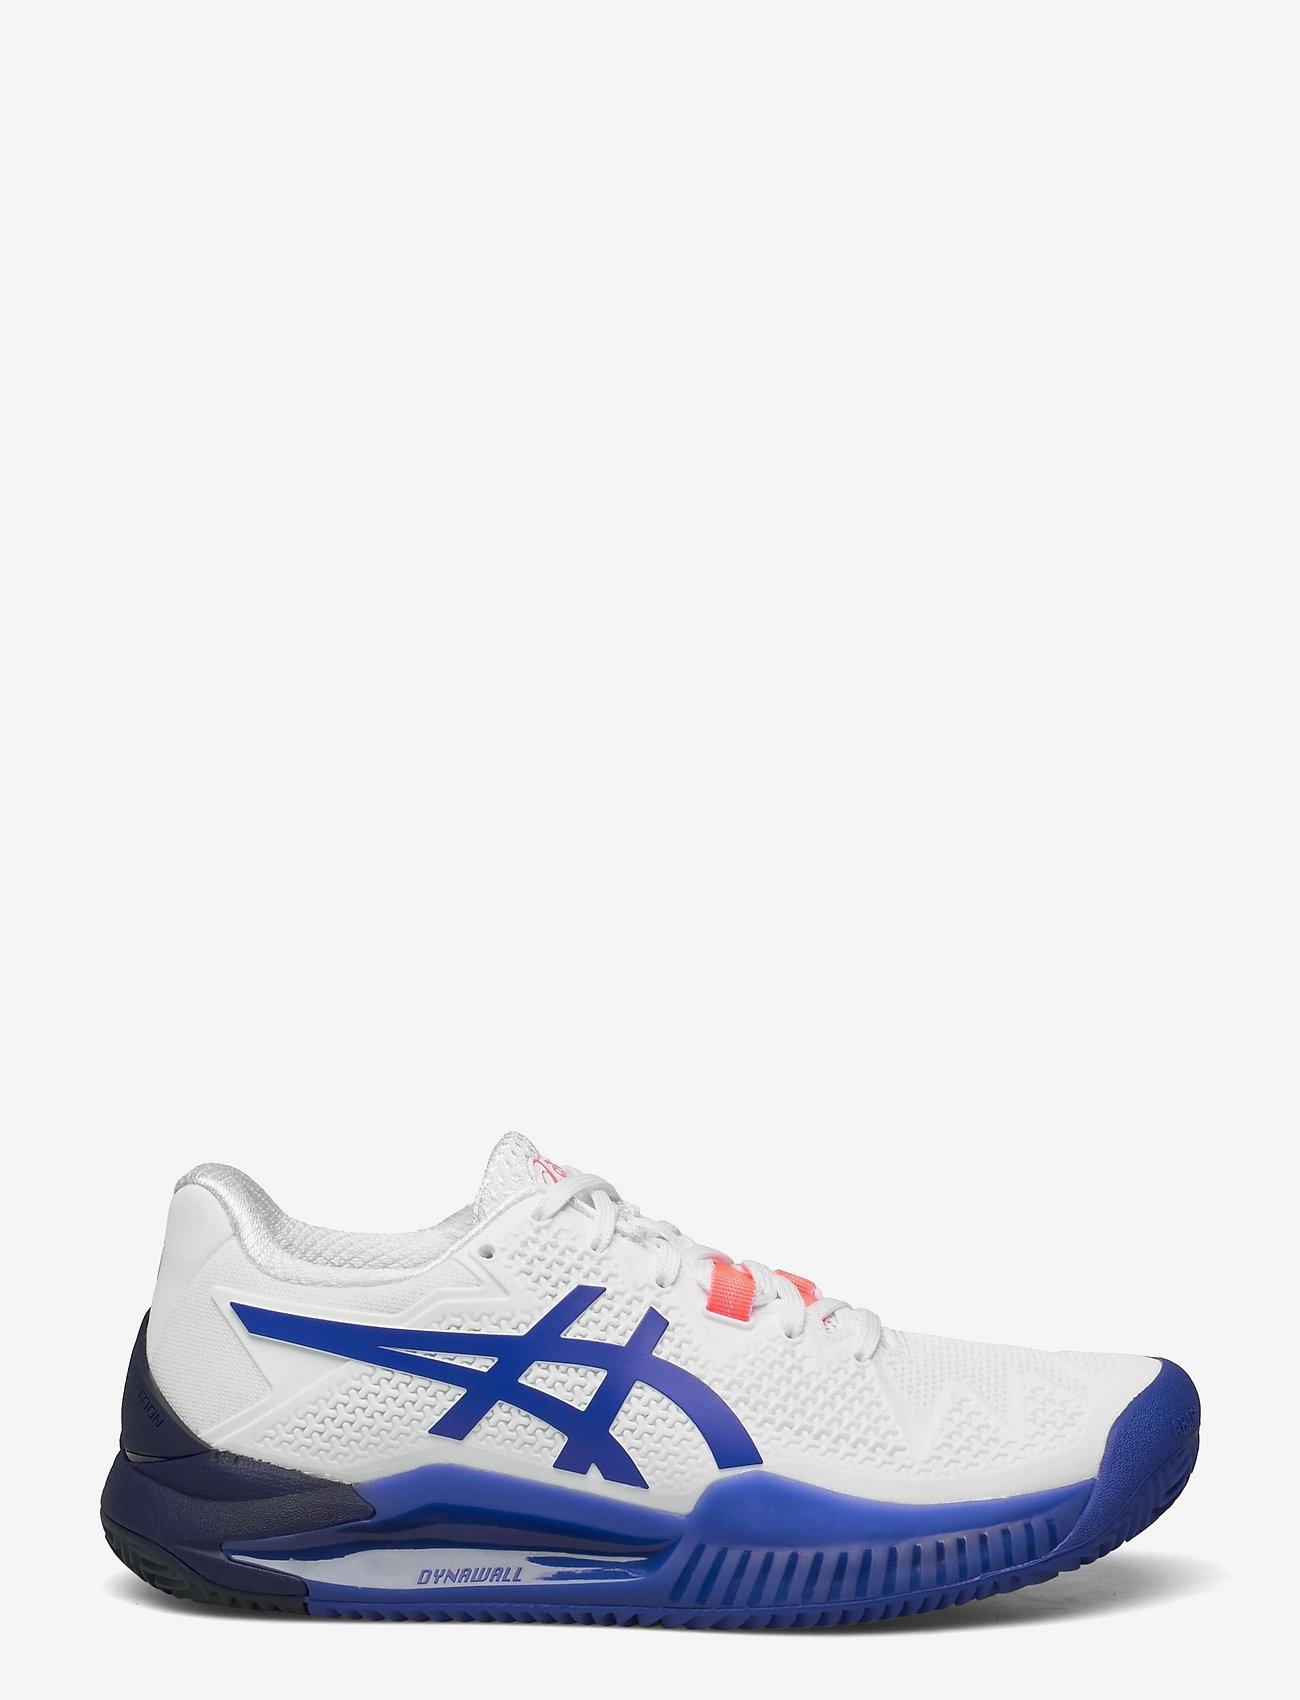 Asics - GEL-RESOLUTION 8 CLAY - ketsjersportsko - white/lapis lazuli blue - 1